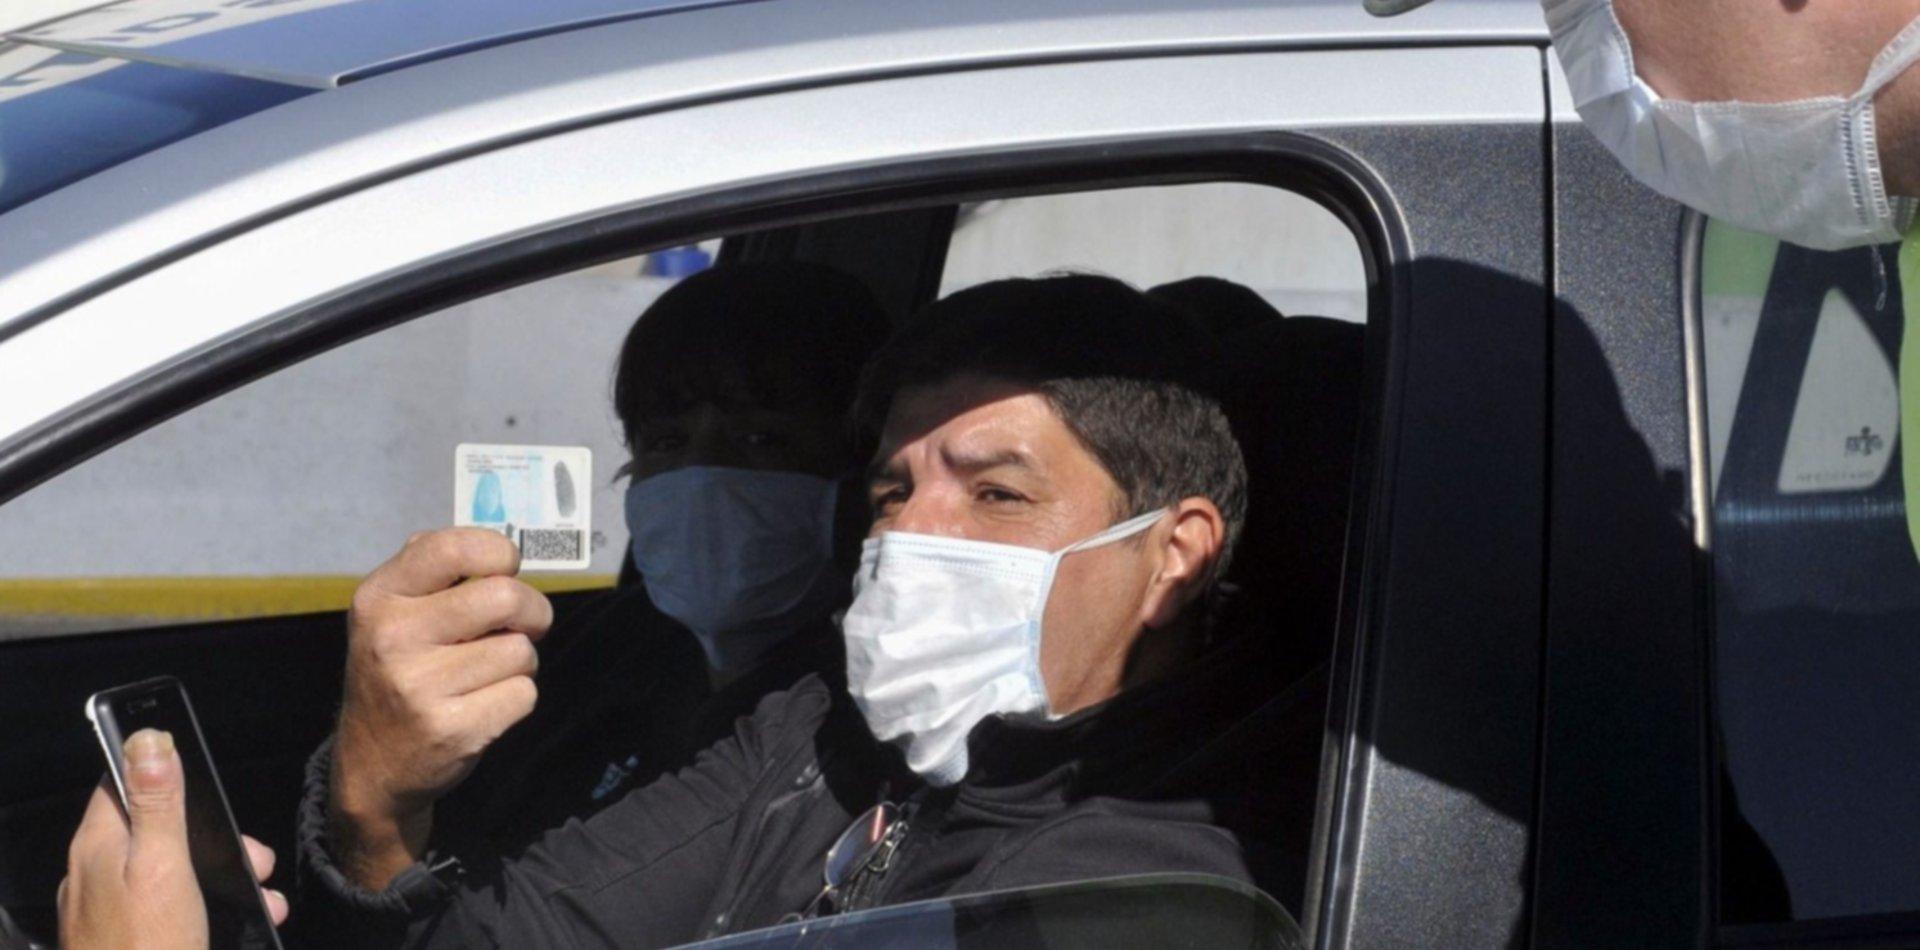 Los concejales de La Plata saldrán a la calle a controlar que se cumpla la cuarentena